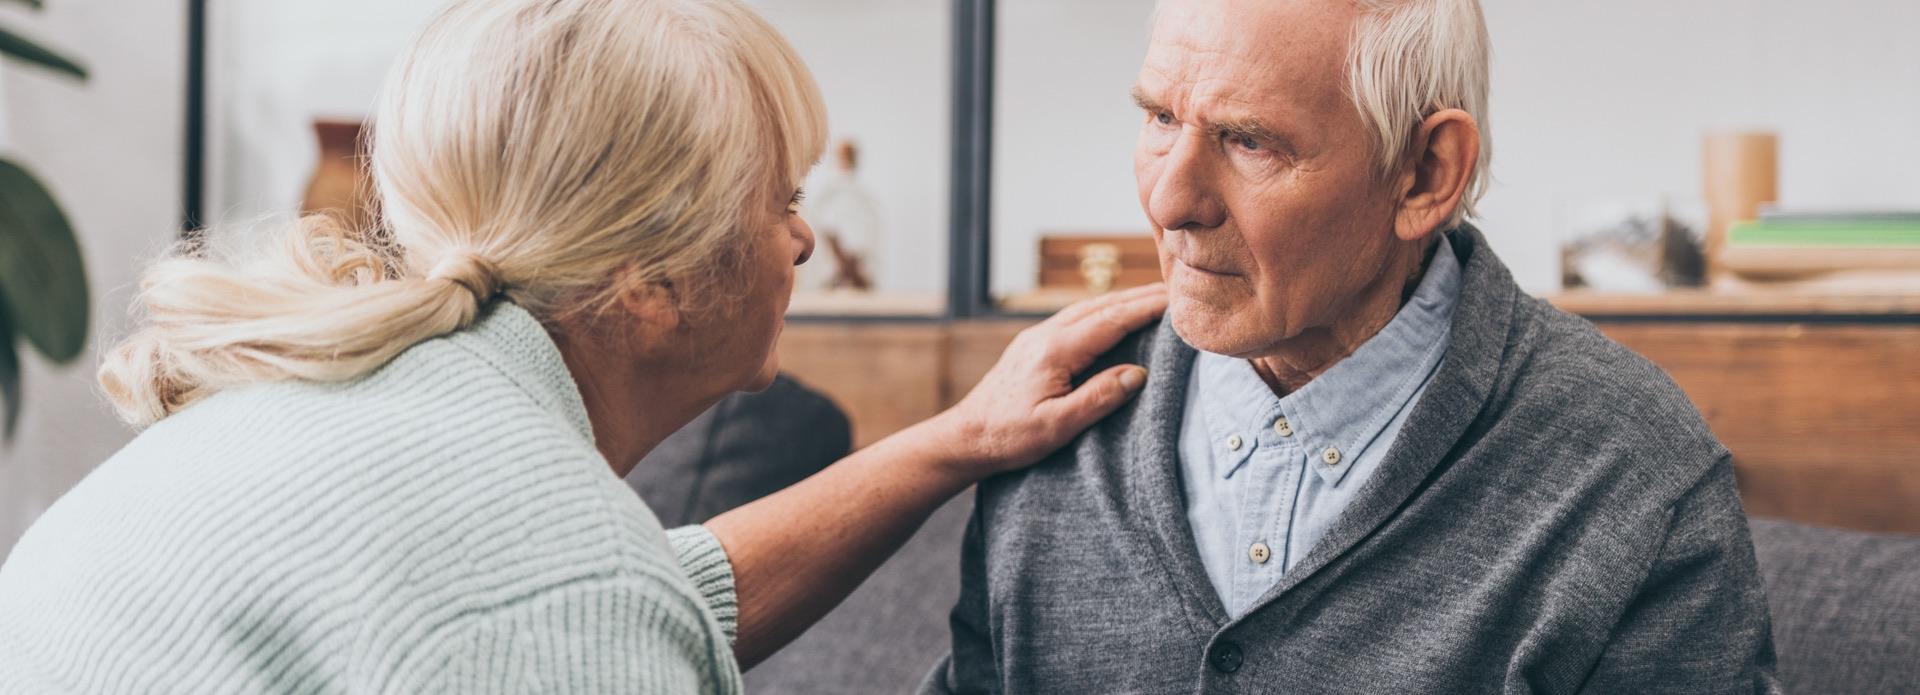 dementia-alzheimer-grandfather